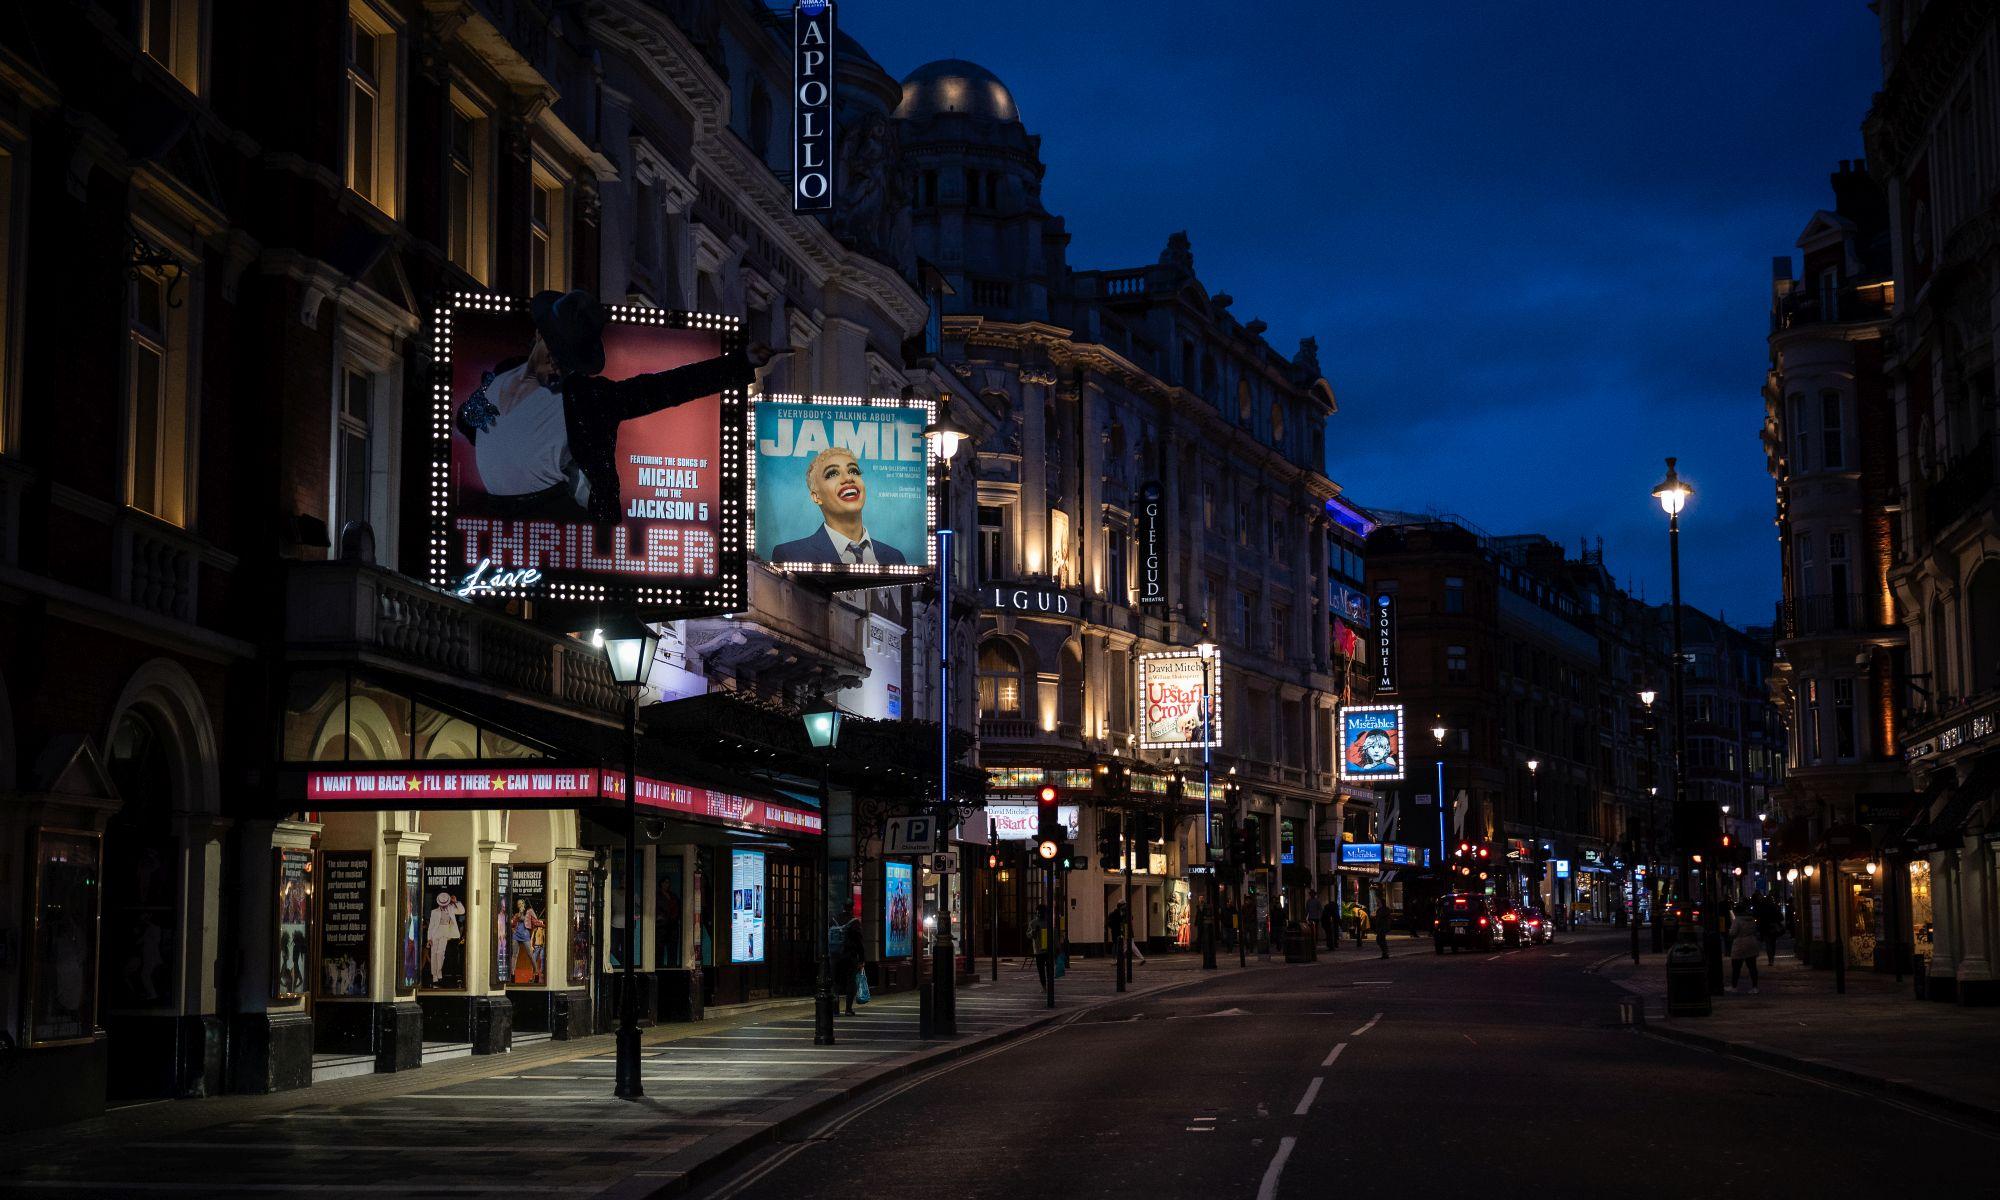 Theatre cannot survive social distancing